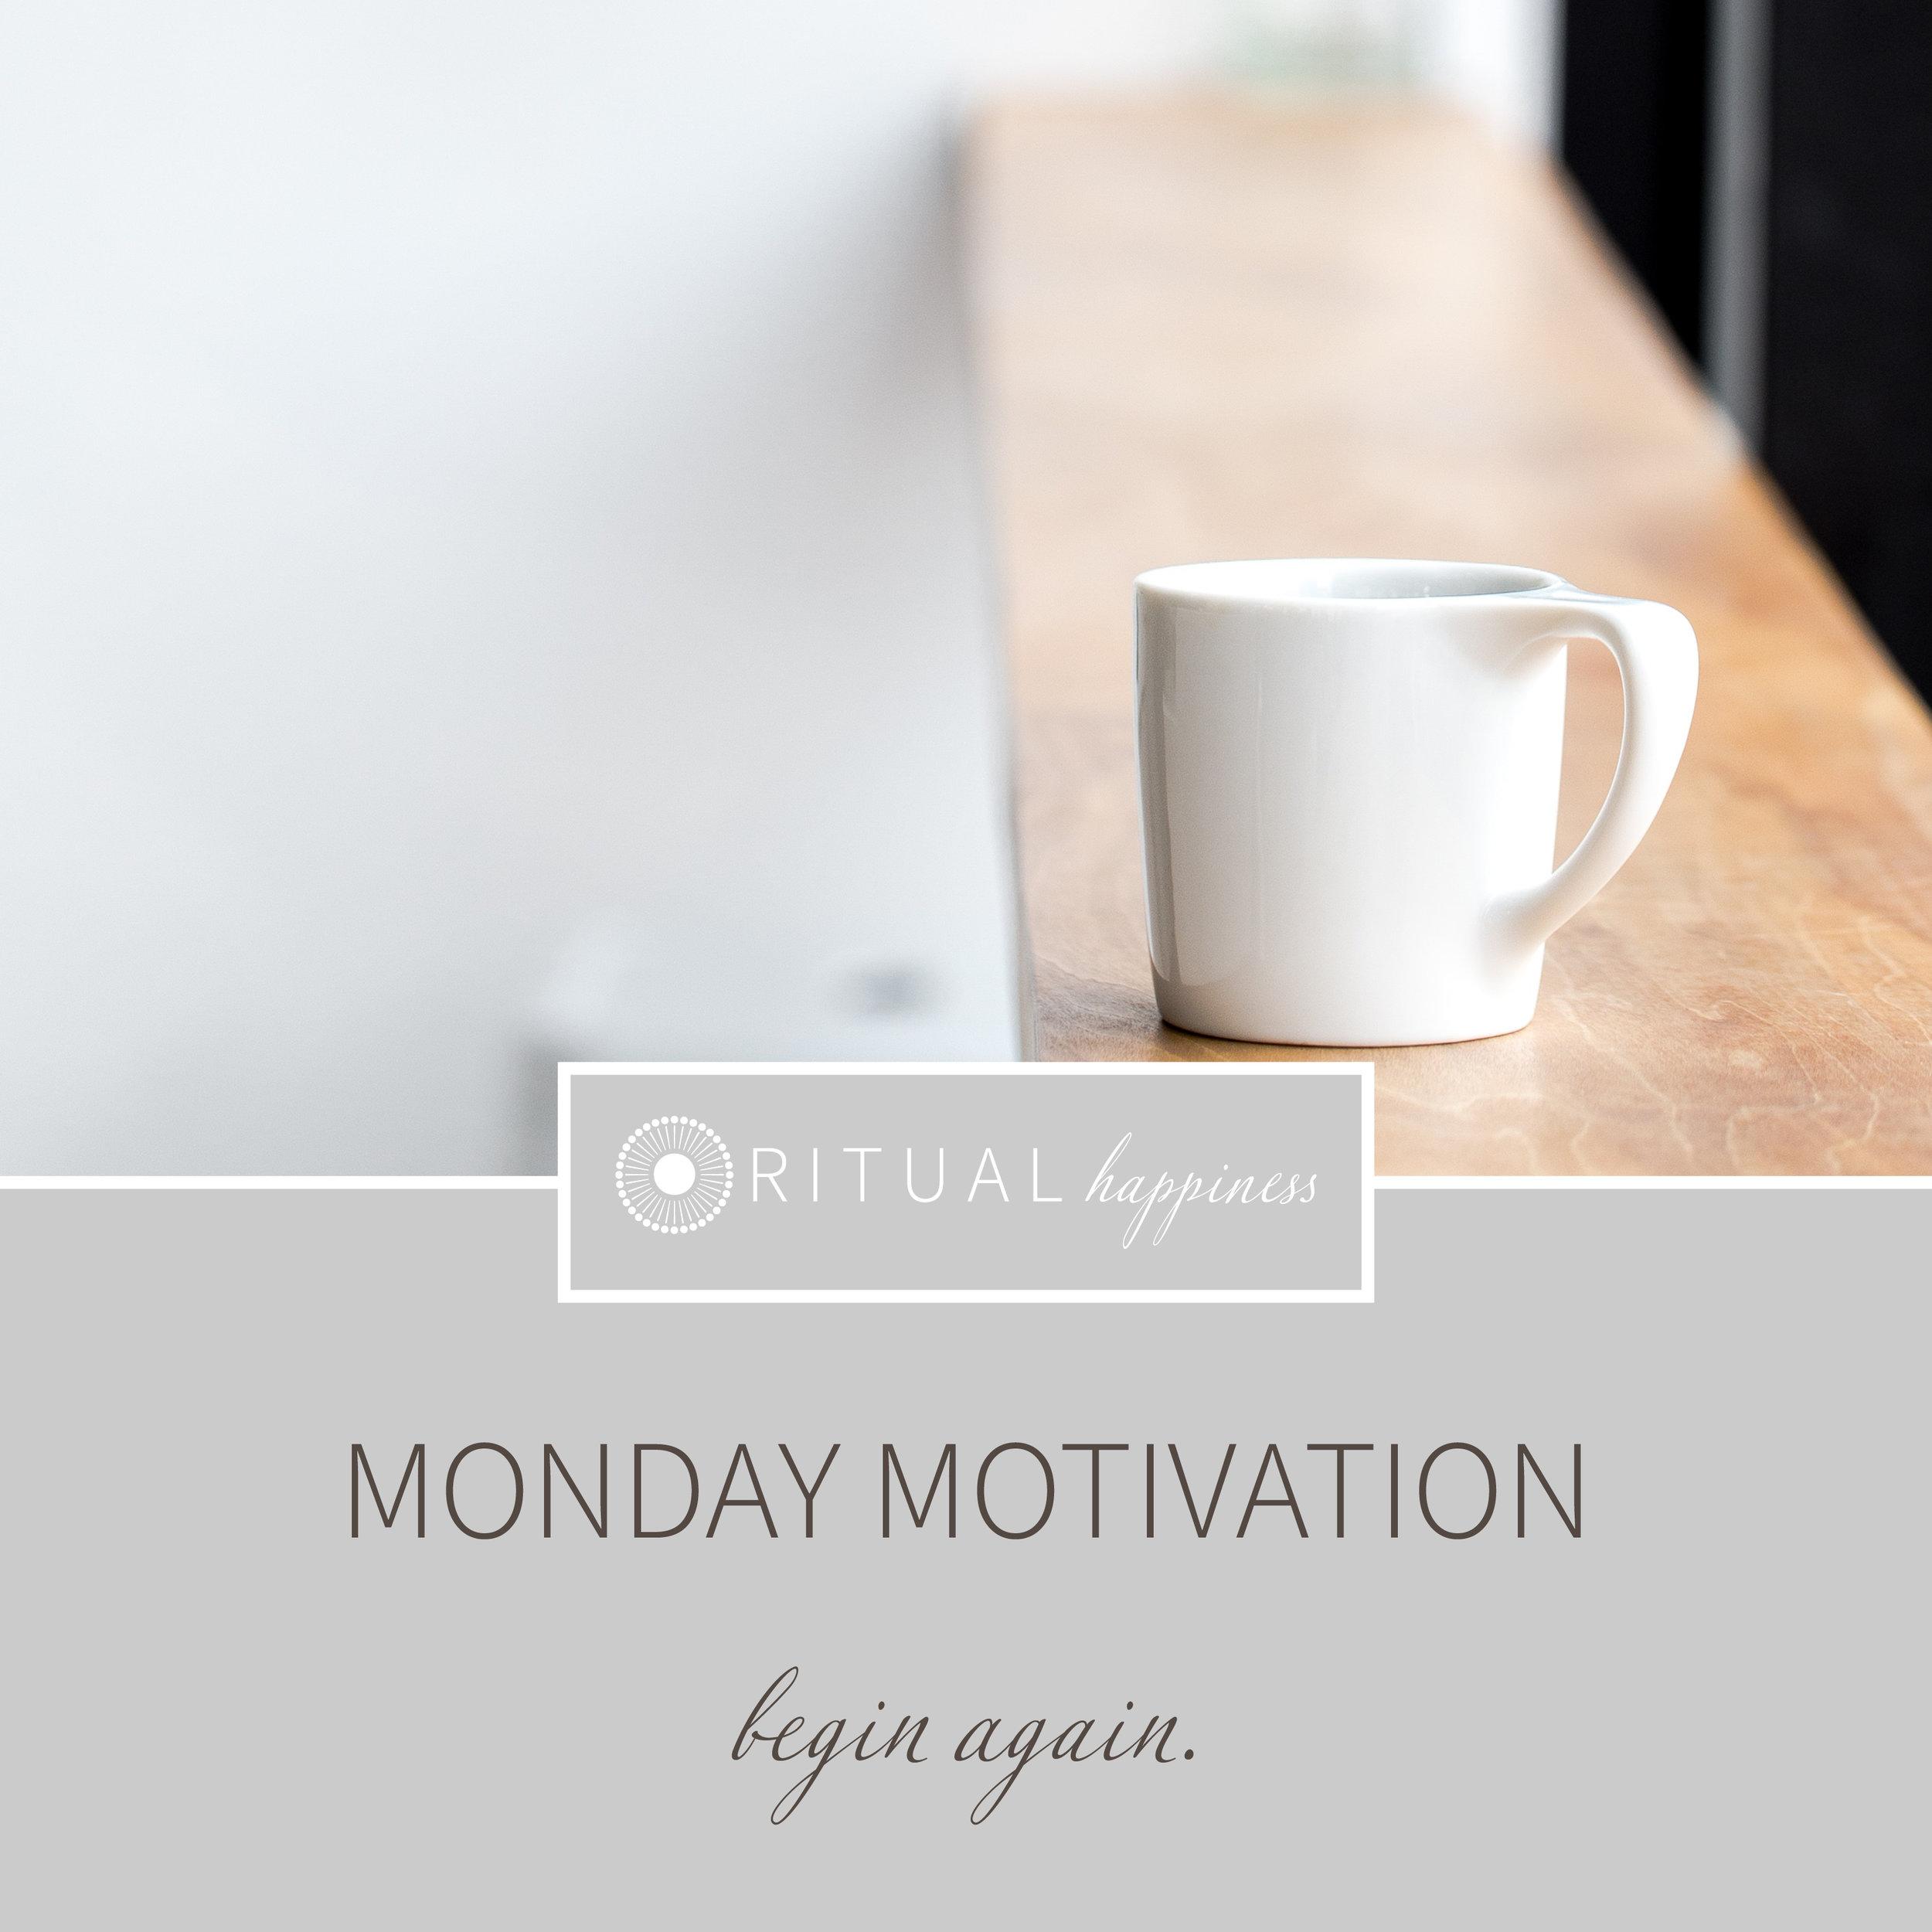 MondayMotivation_beginagain.jpg